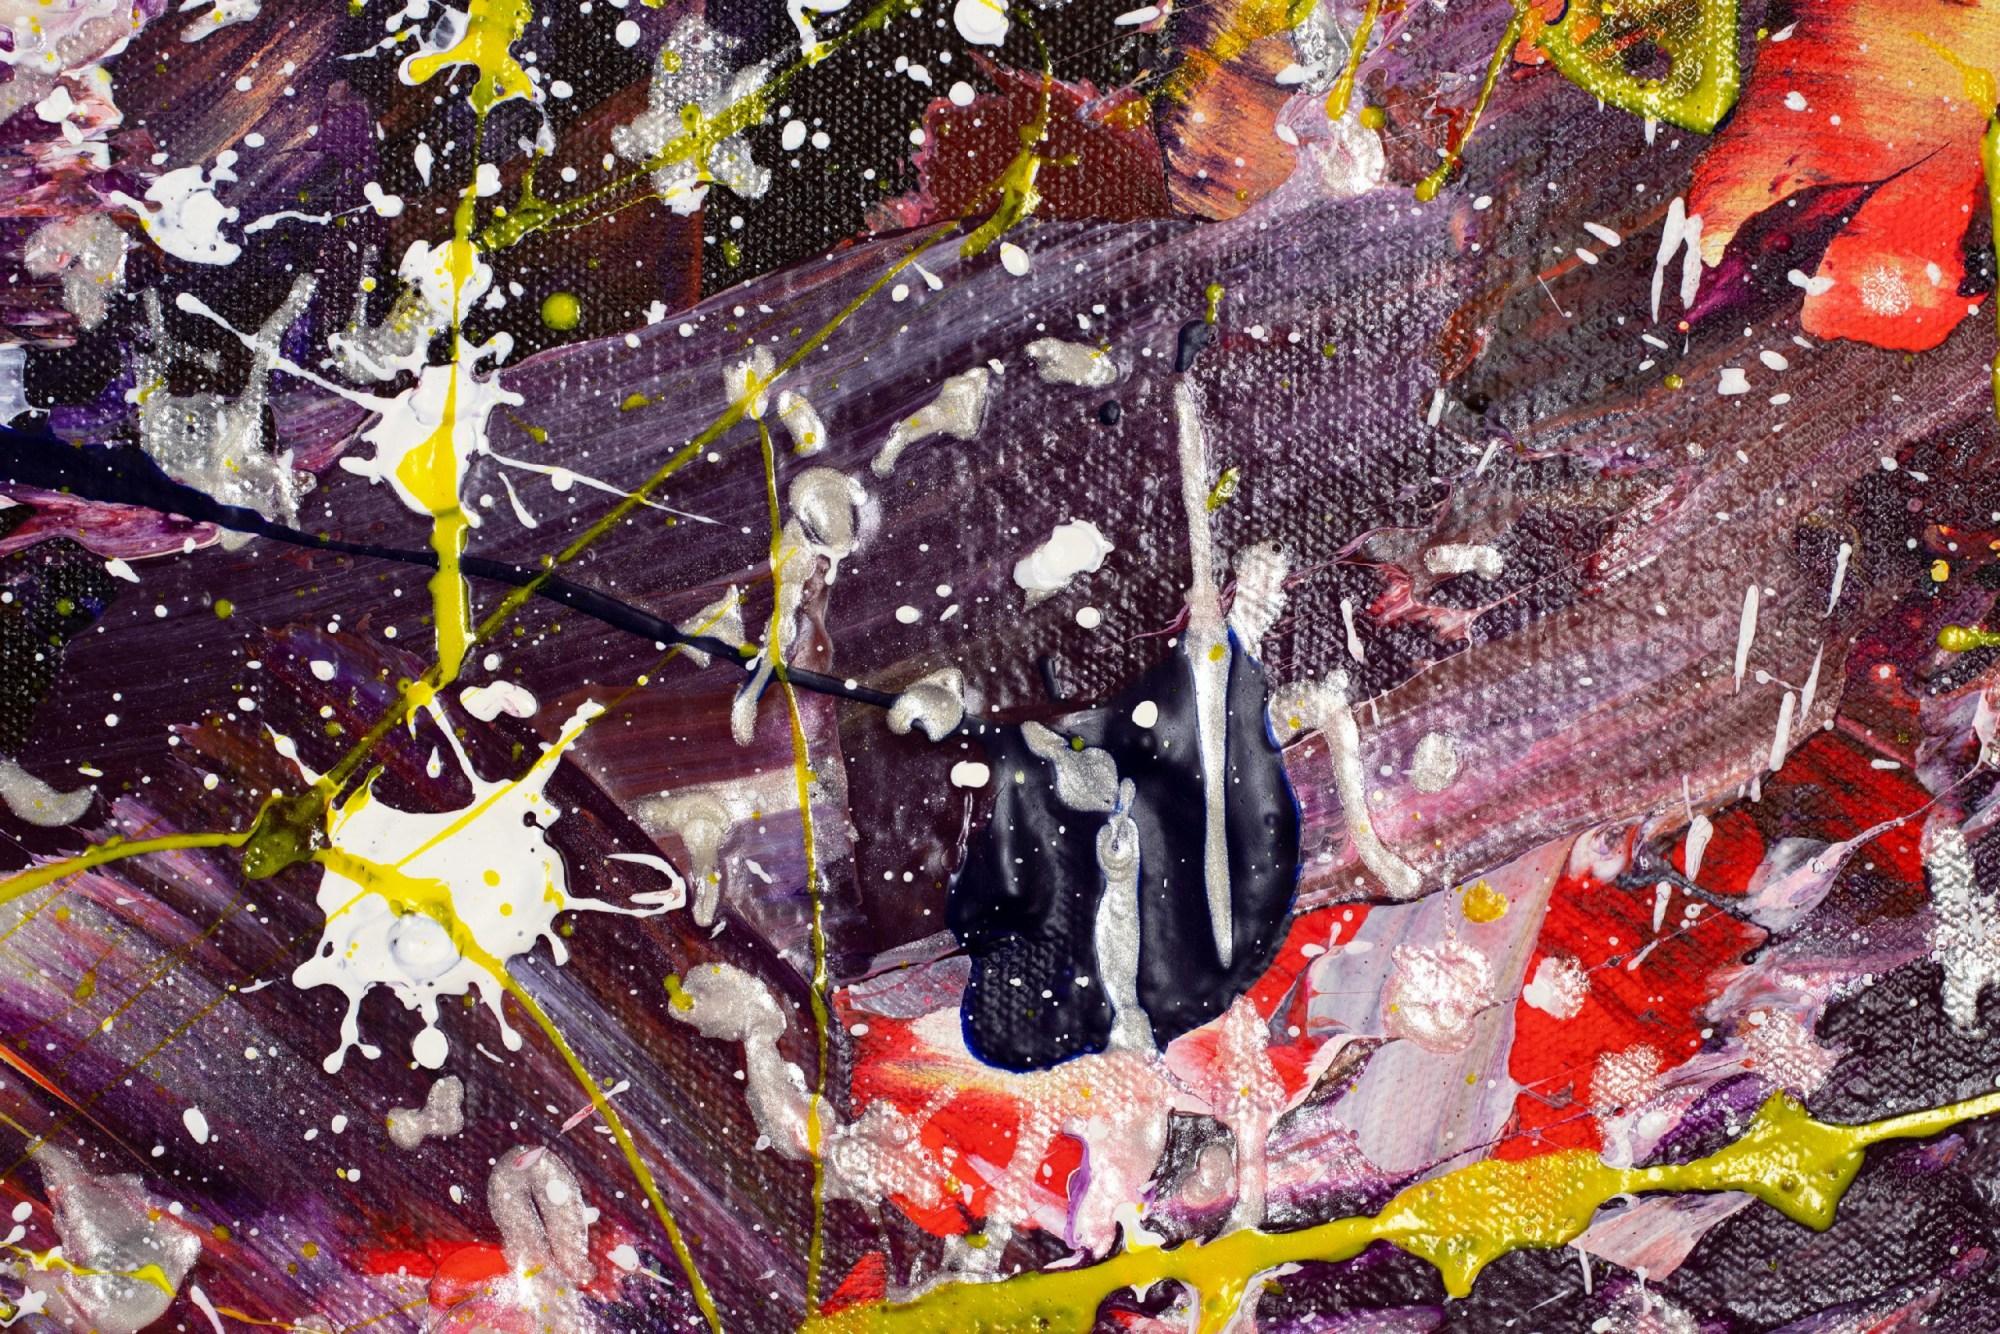 SOLD - DETAIL - Autumn Carousel (Autumnal Equinox) 2021 by Nestor Toro